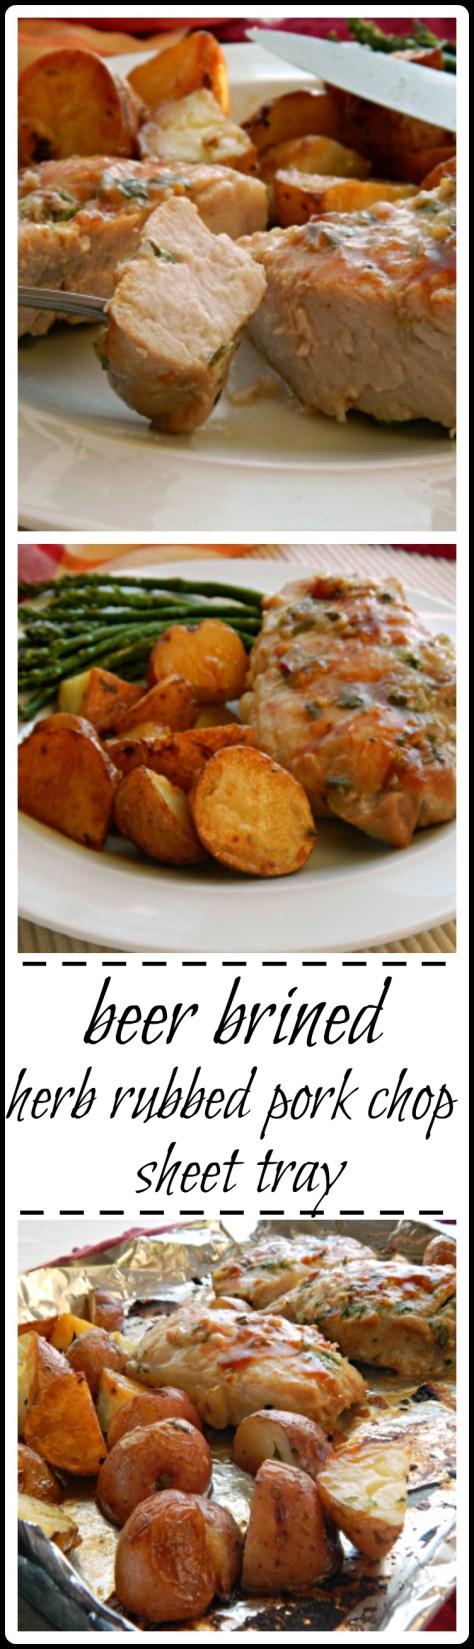 One pan pork chops & potatoes - simple gourmet